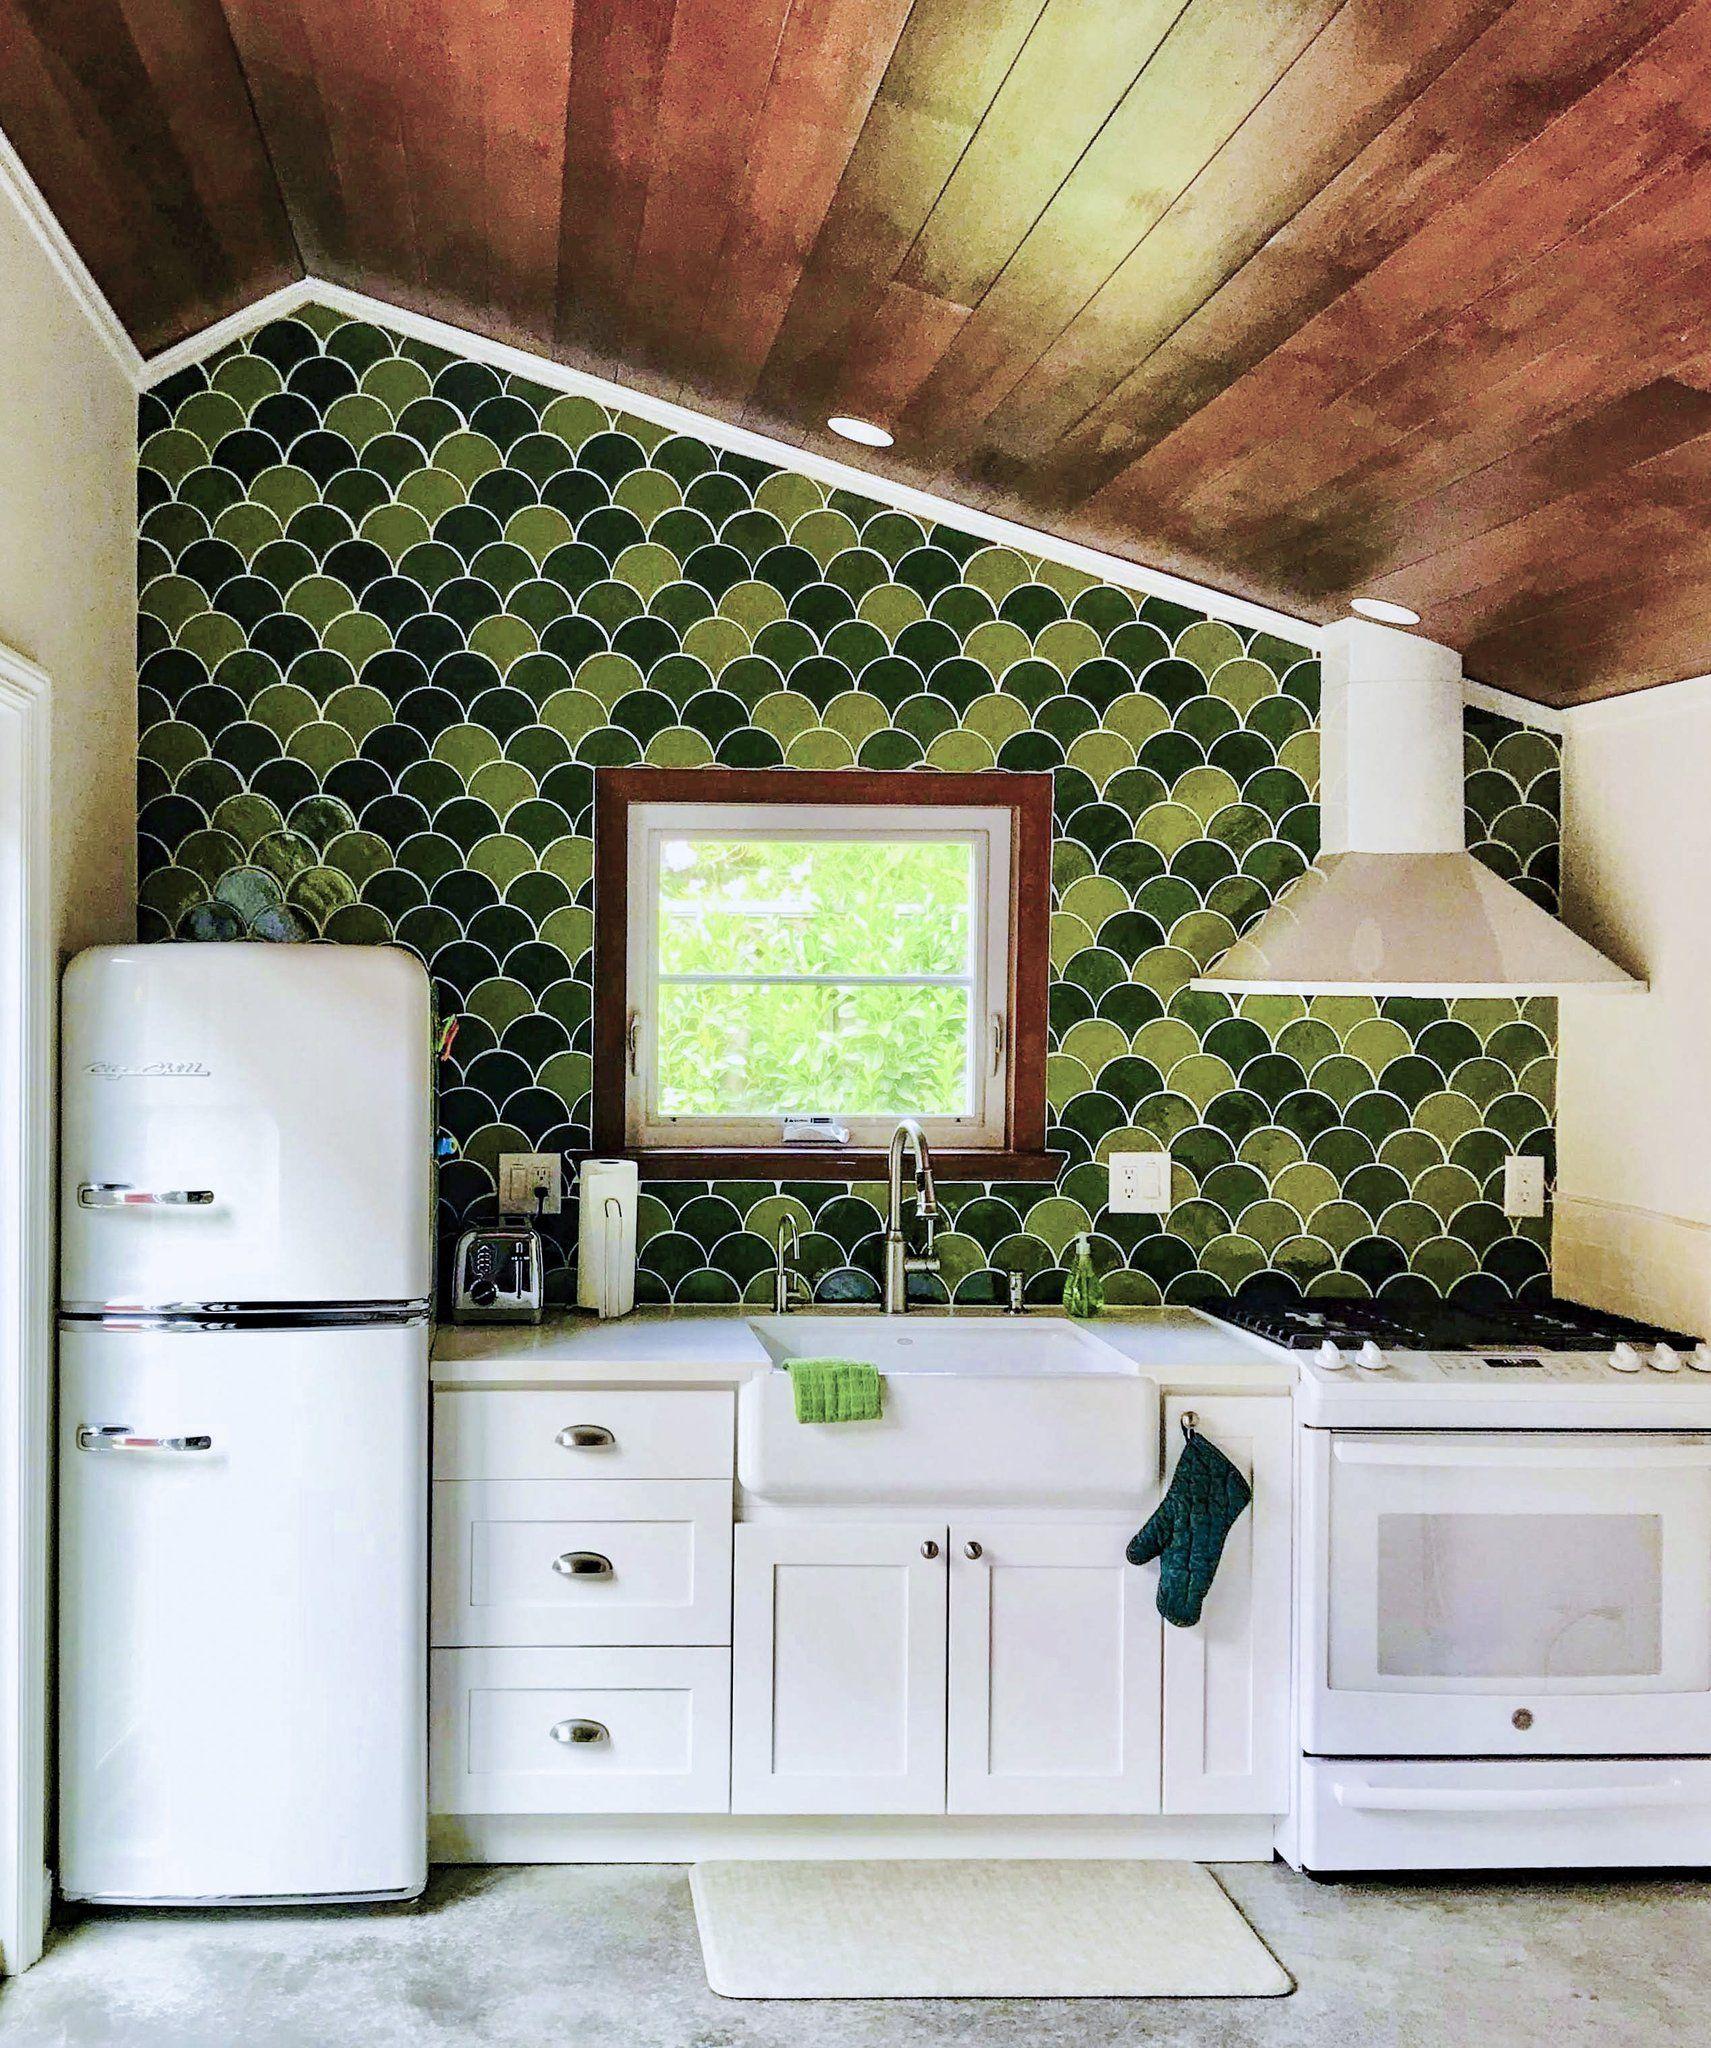 bohemian chic decor ideas for your home interior design kitchen bohemian chic decor small on boho chic home decor kitchen id=31621